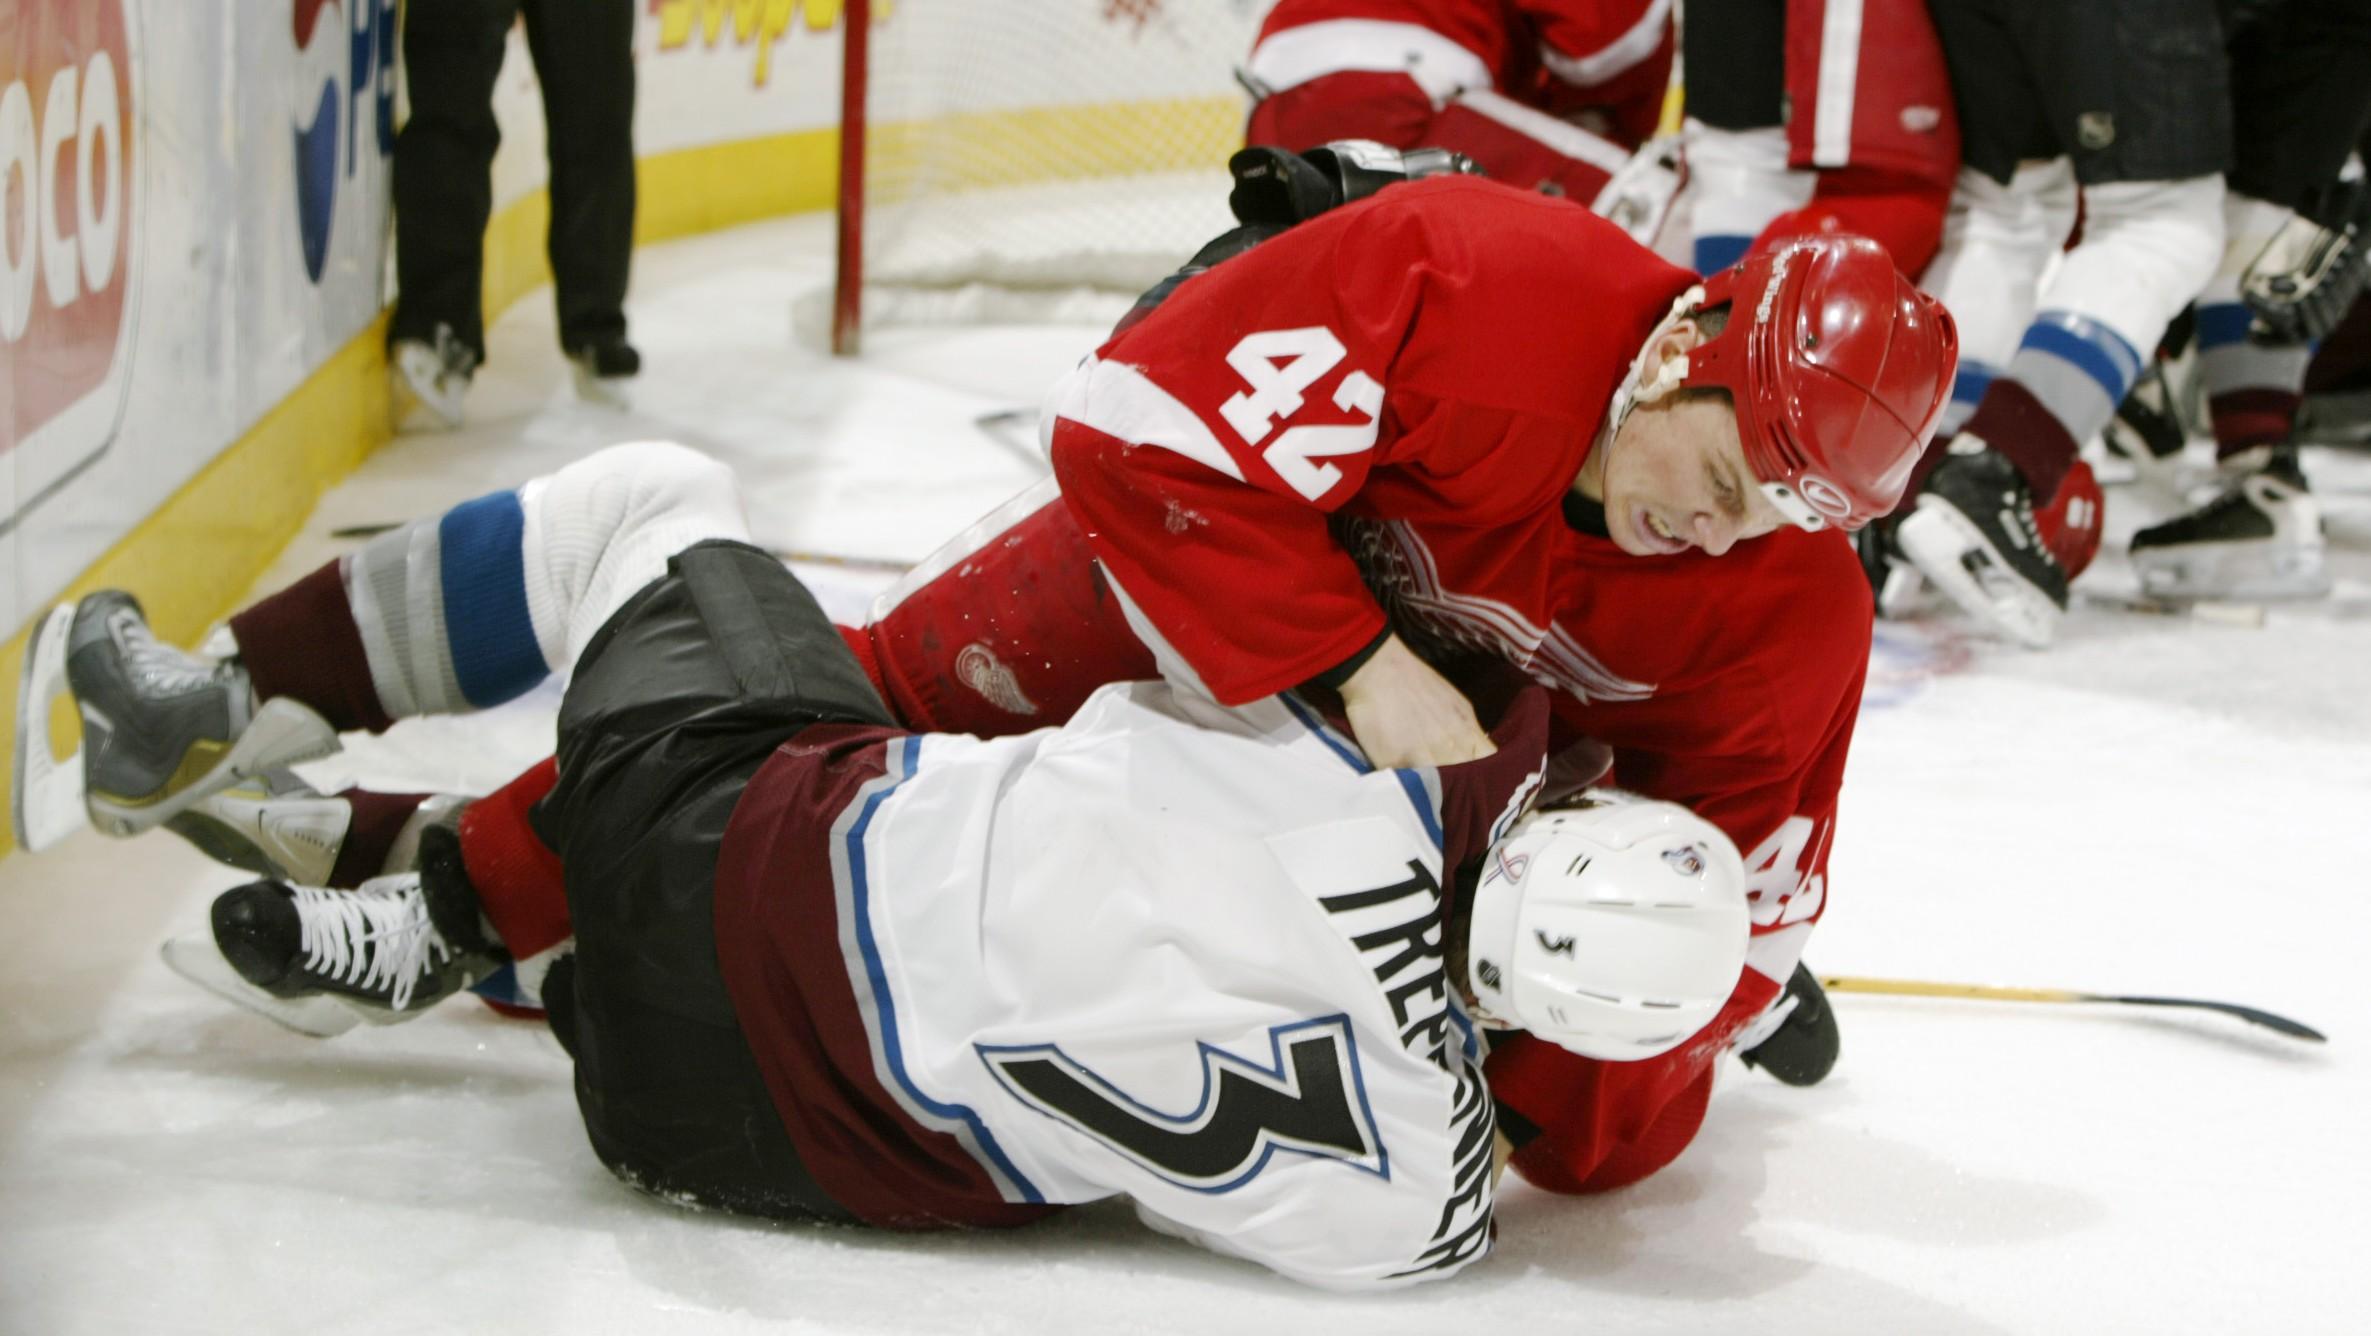 d4fb51a01 » The Heavyweight Belt of NHL Rivalries